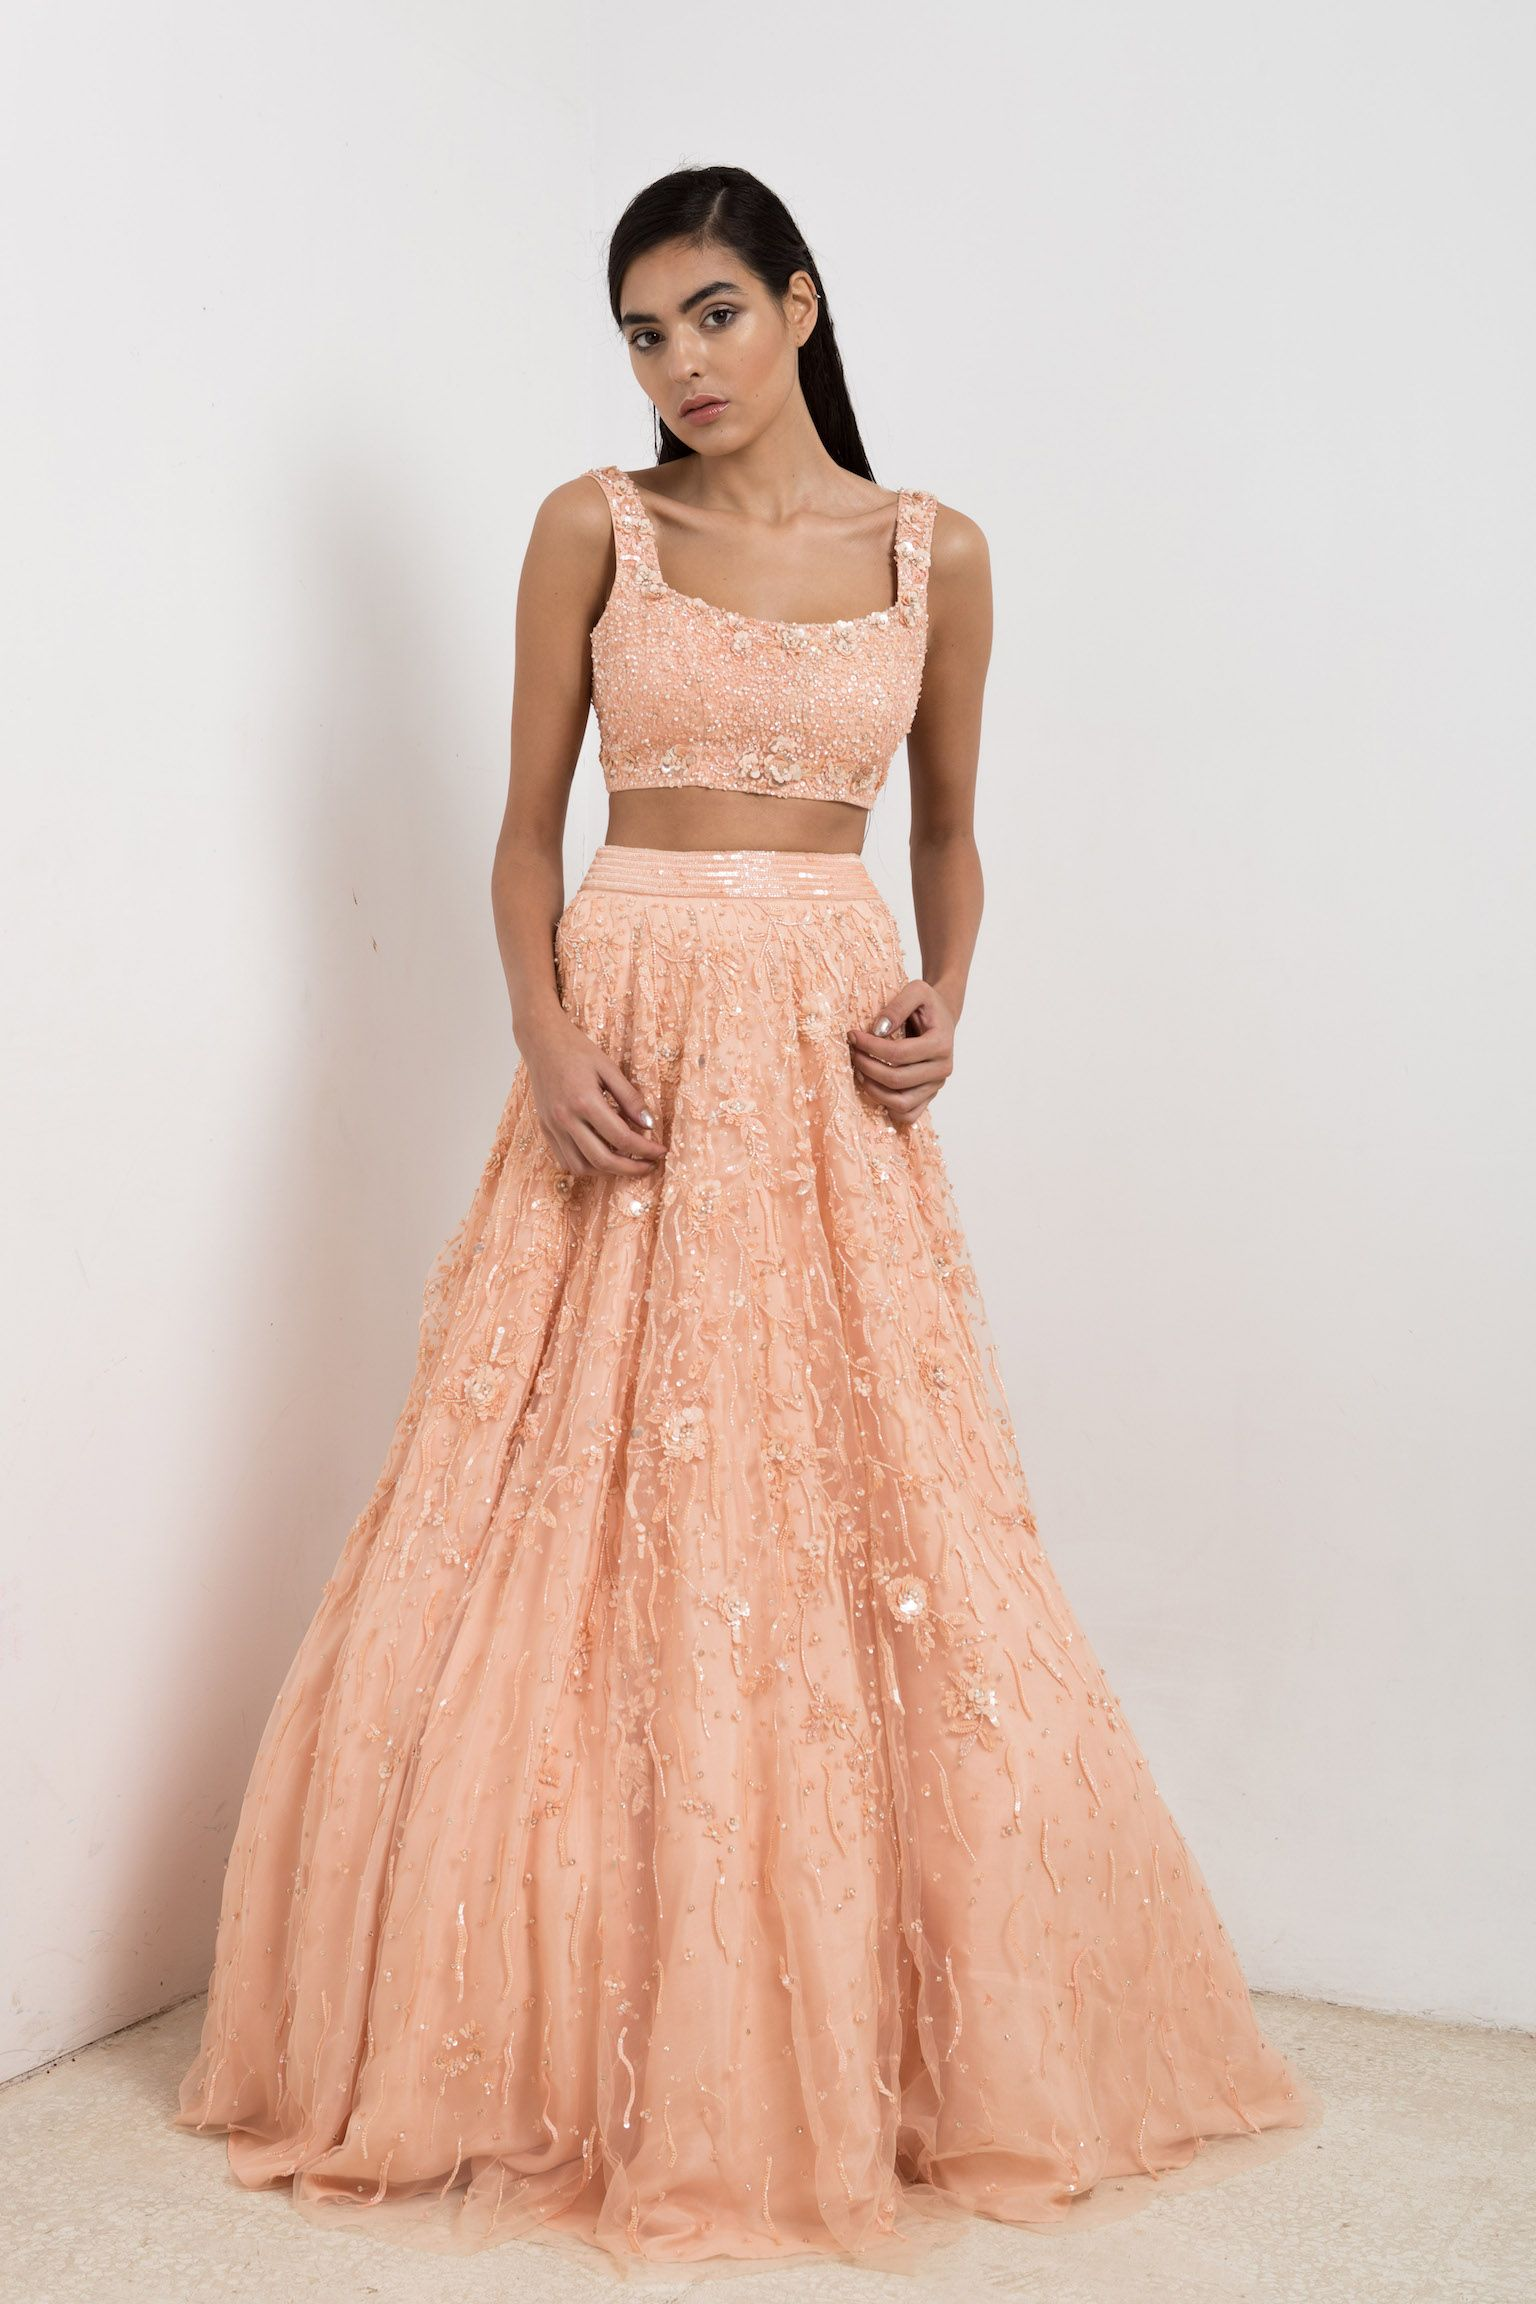 Peach bridal lehenga and crop top Ceremony dresses